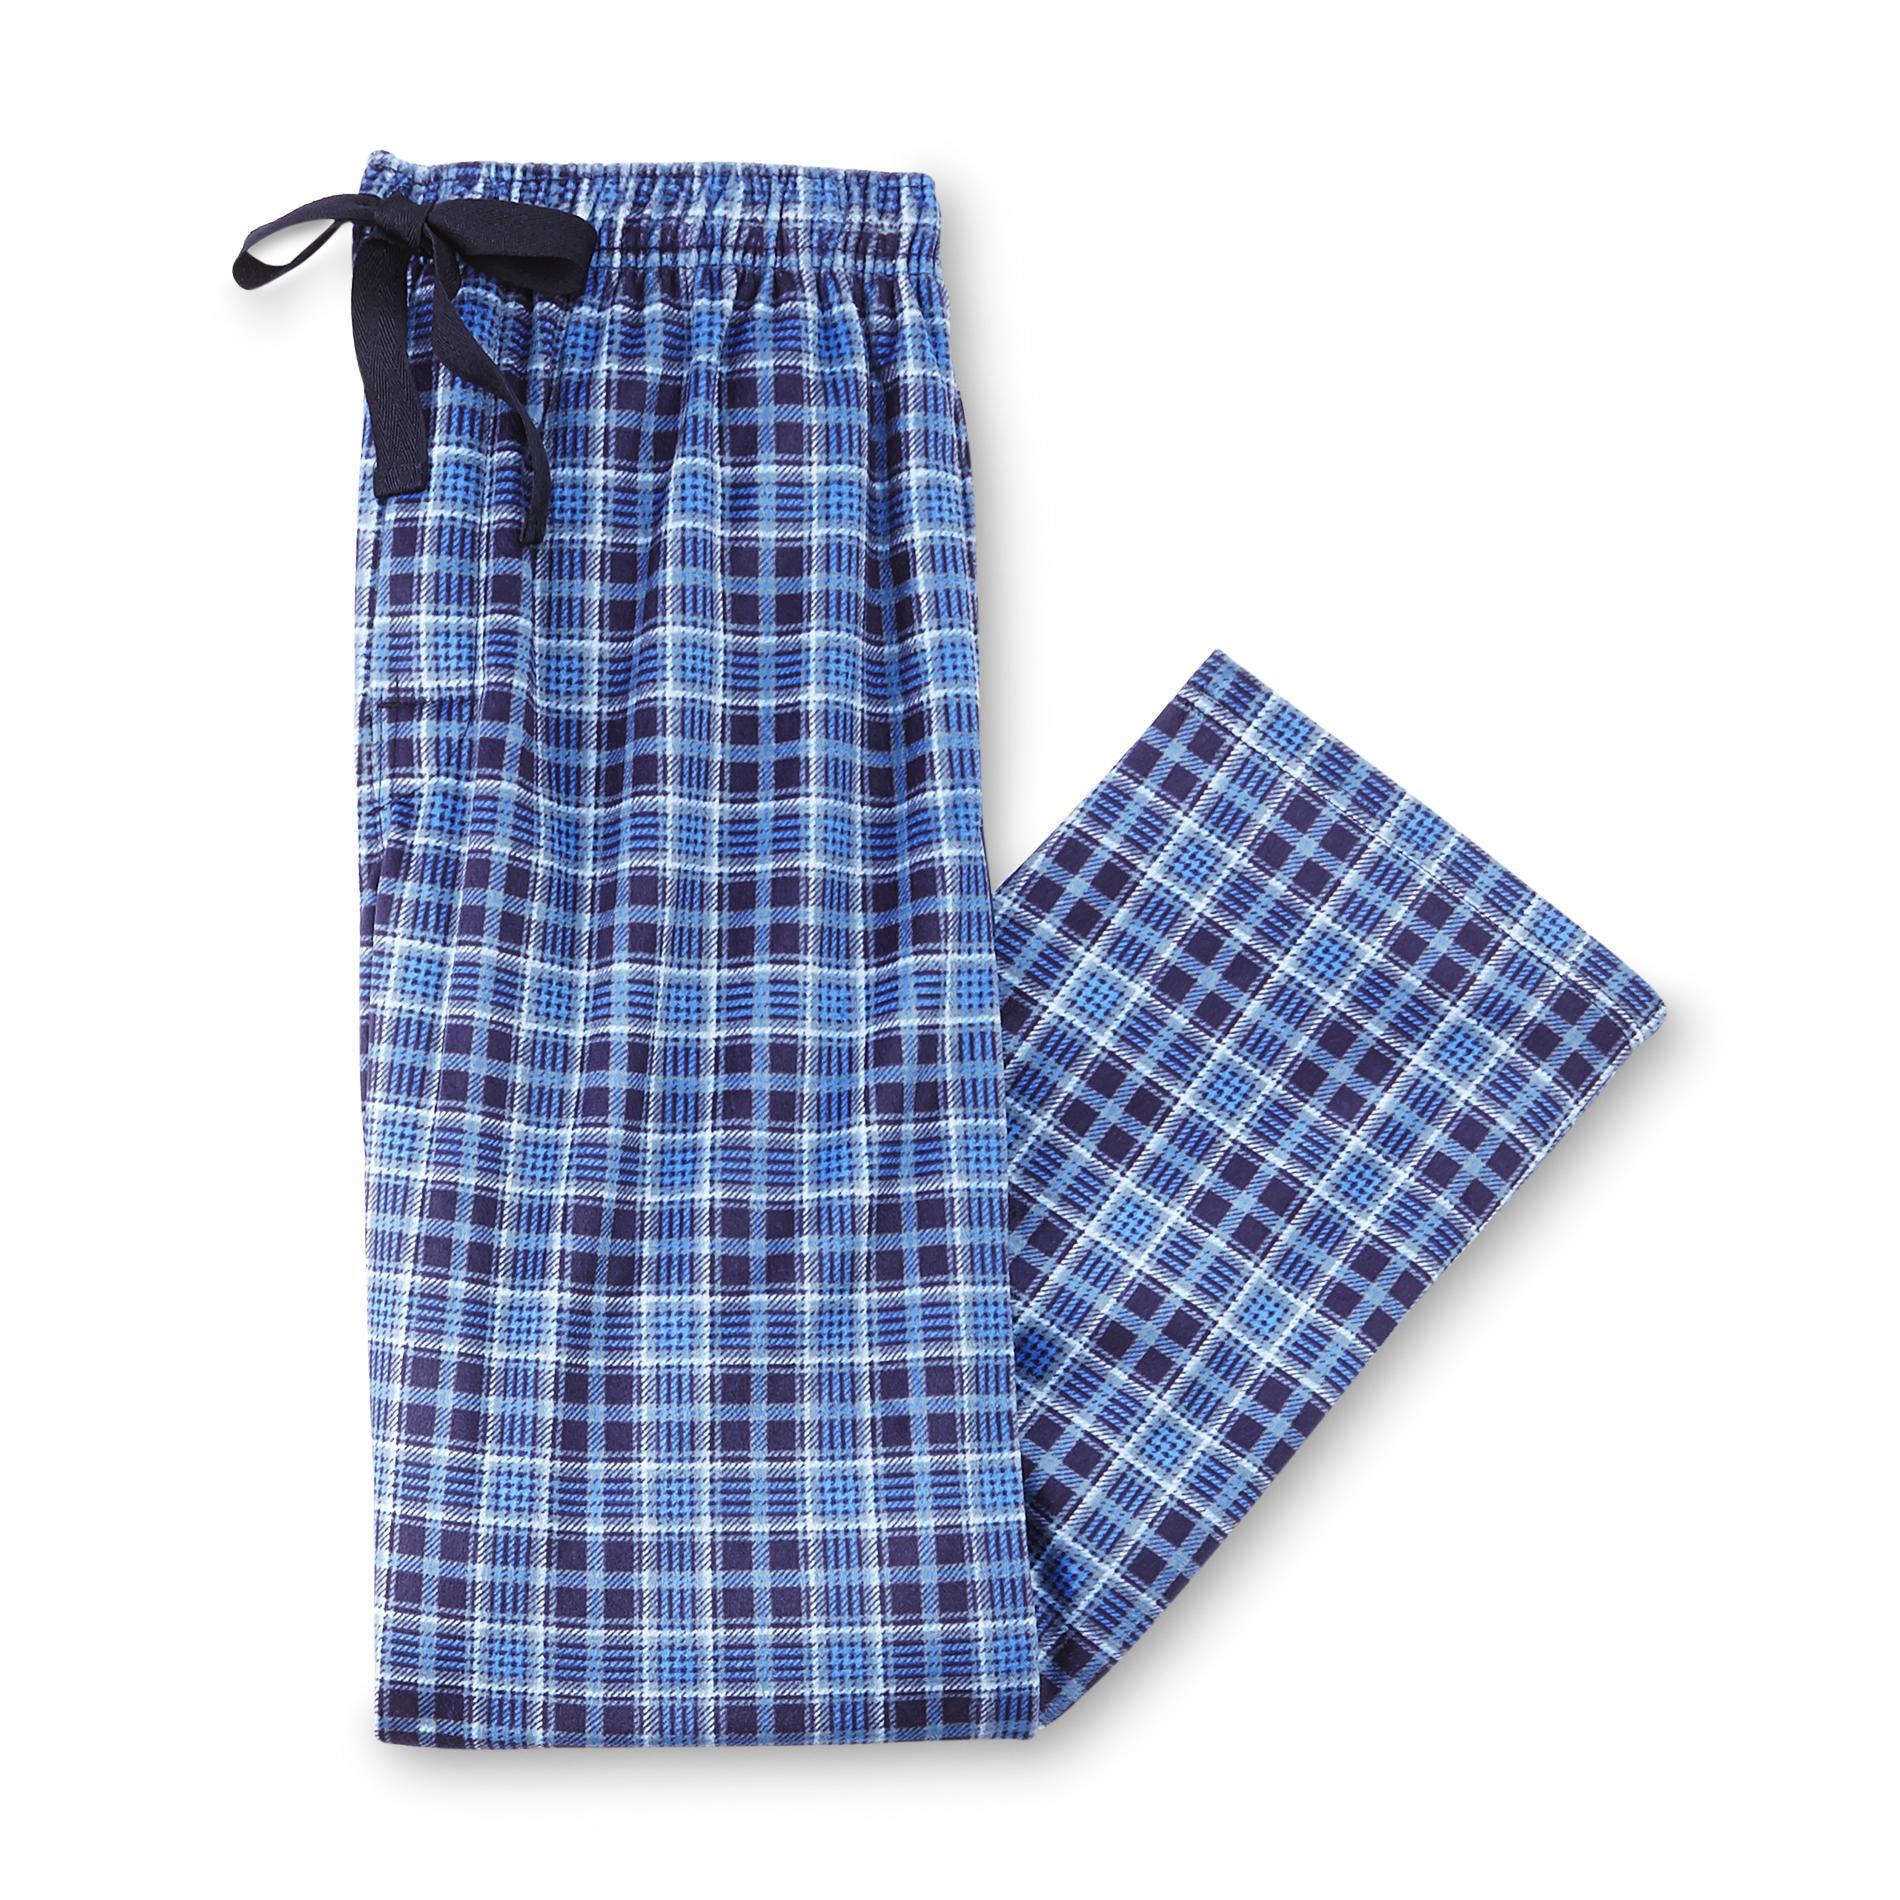 Fruit of the Loom Men's Flannel Pajama Pants - Plaid